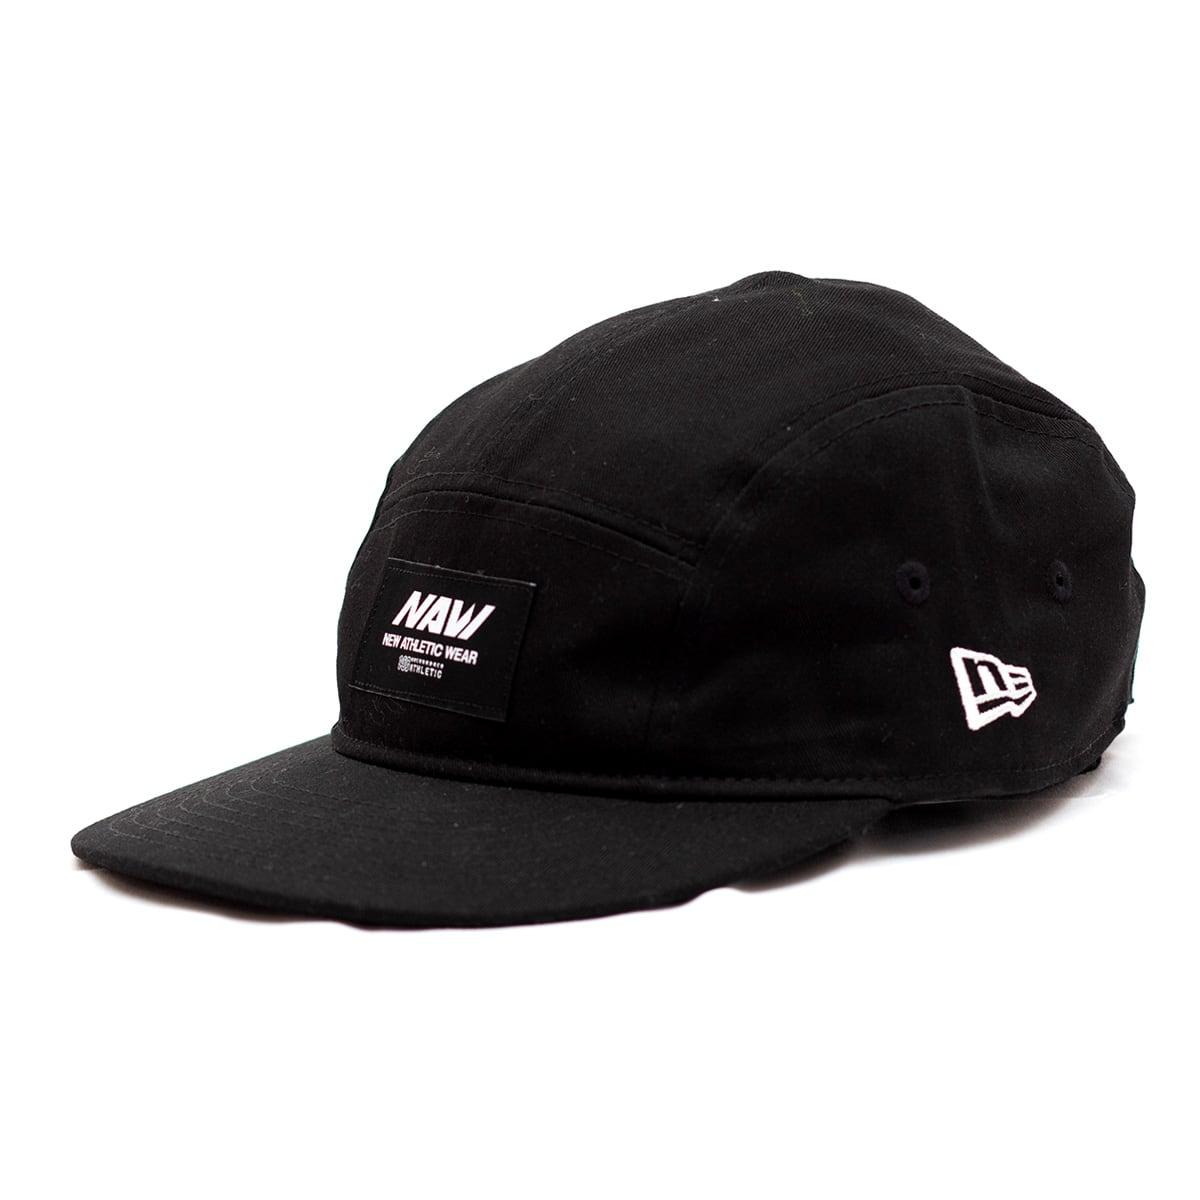 100A x NEW ERA® NAW JET CAP BLACK 20SU-I_photo_large